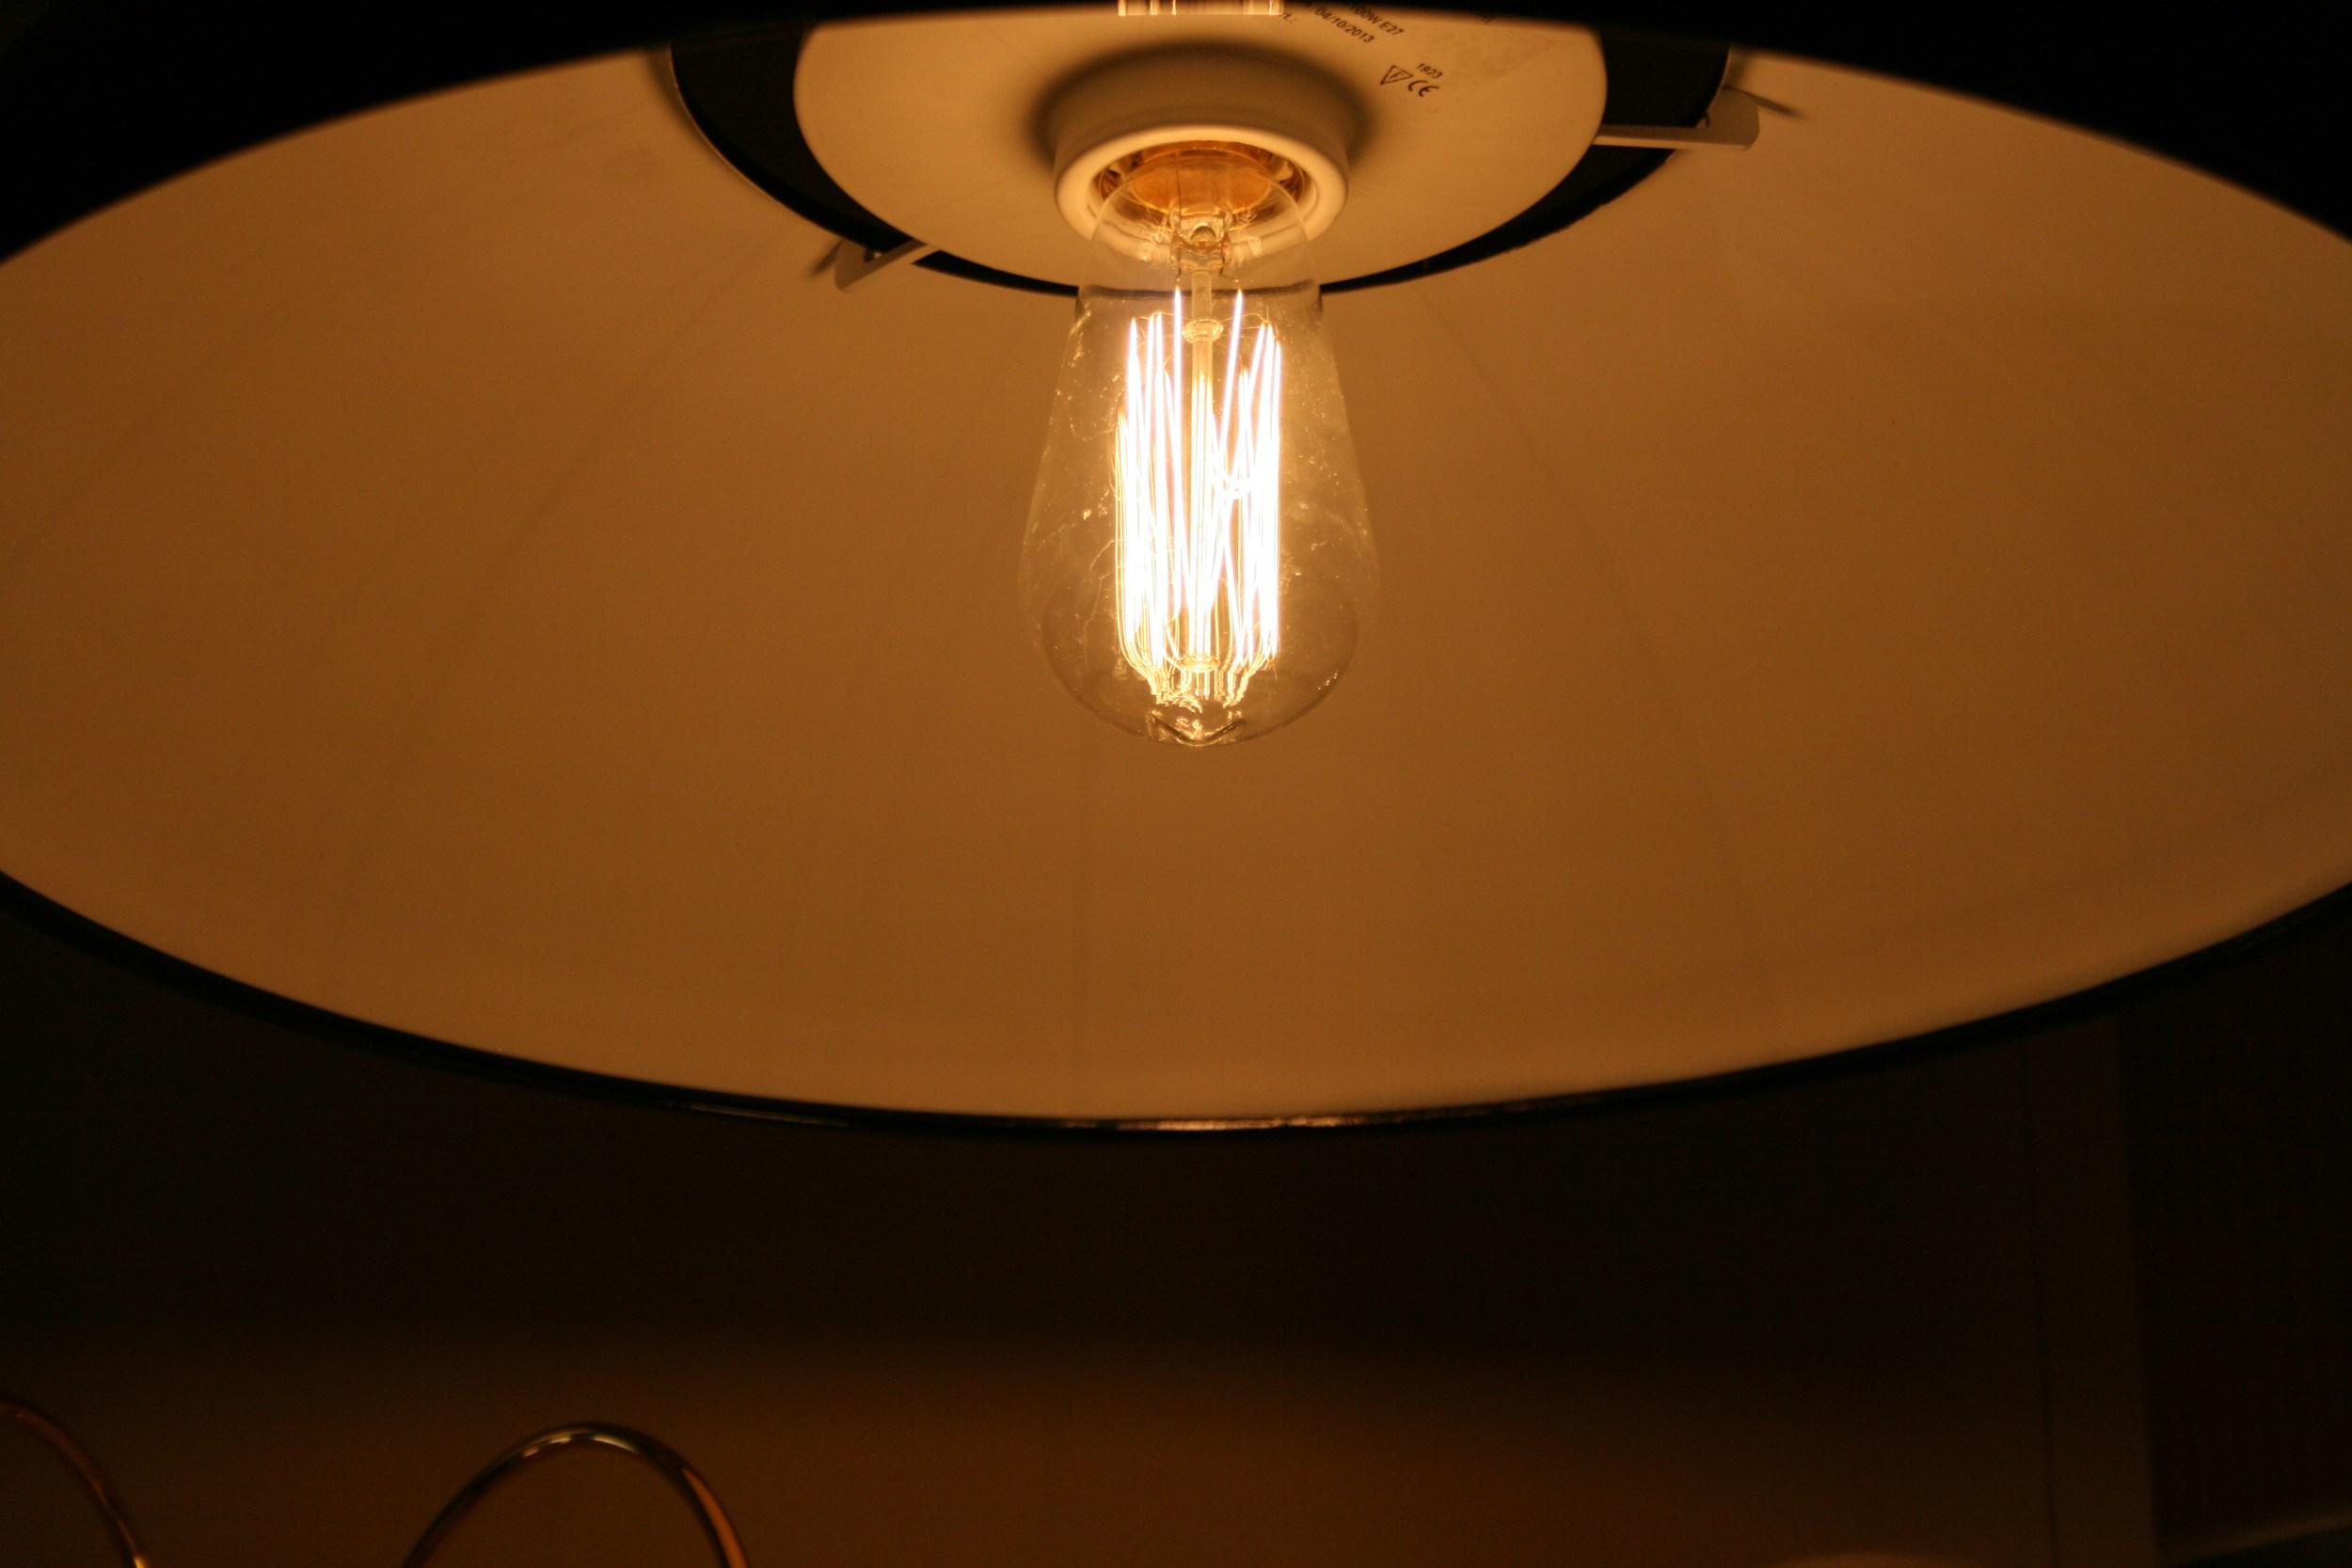 e27 kohlefadenlampe 94 15366 60 60w von lucide leuchtmittel trafo innenleuchten. Black Bedroom Furniture Sets. Home Design Ideas